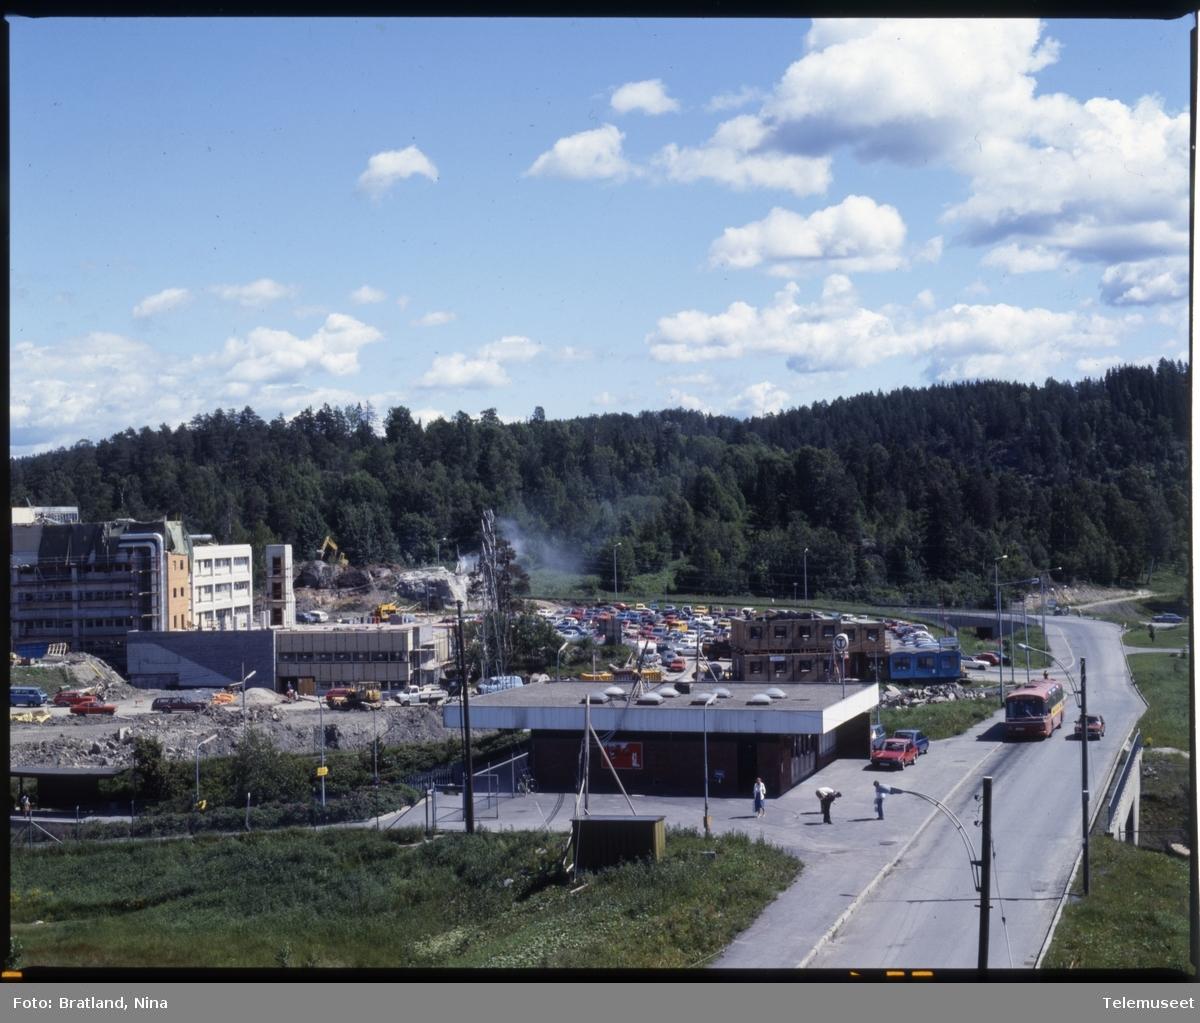 Byggearbeid Norsk Data på Skullerud Oslo